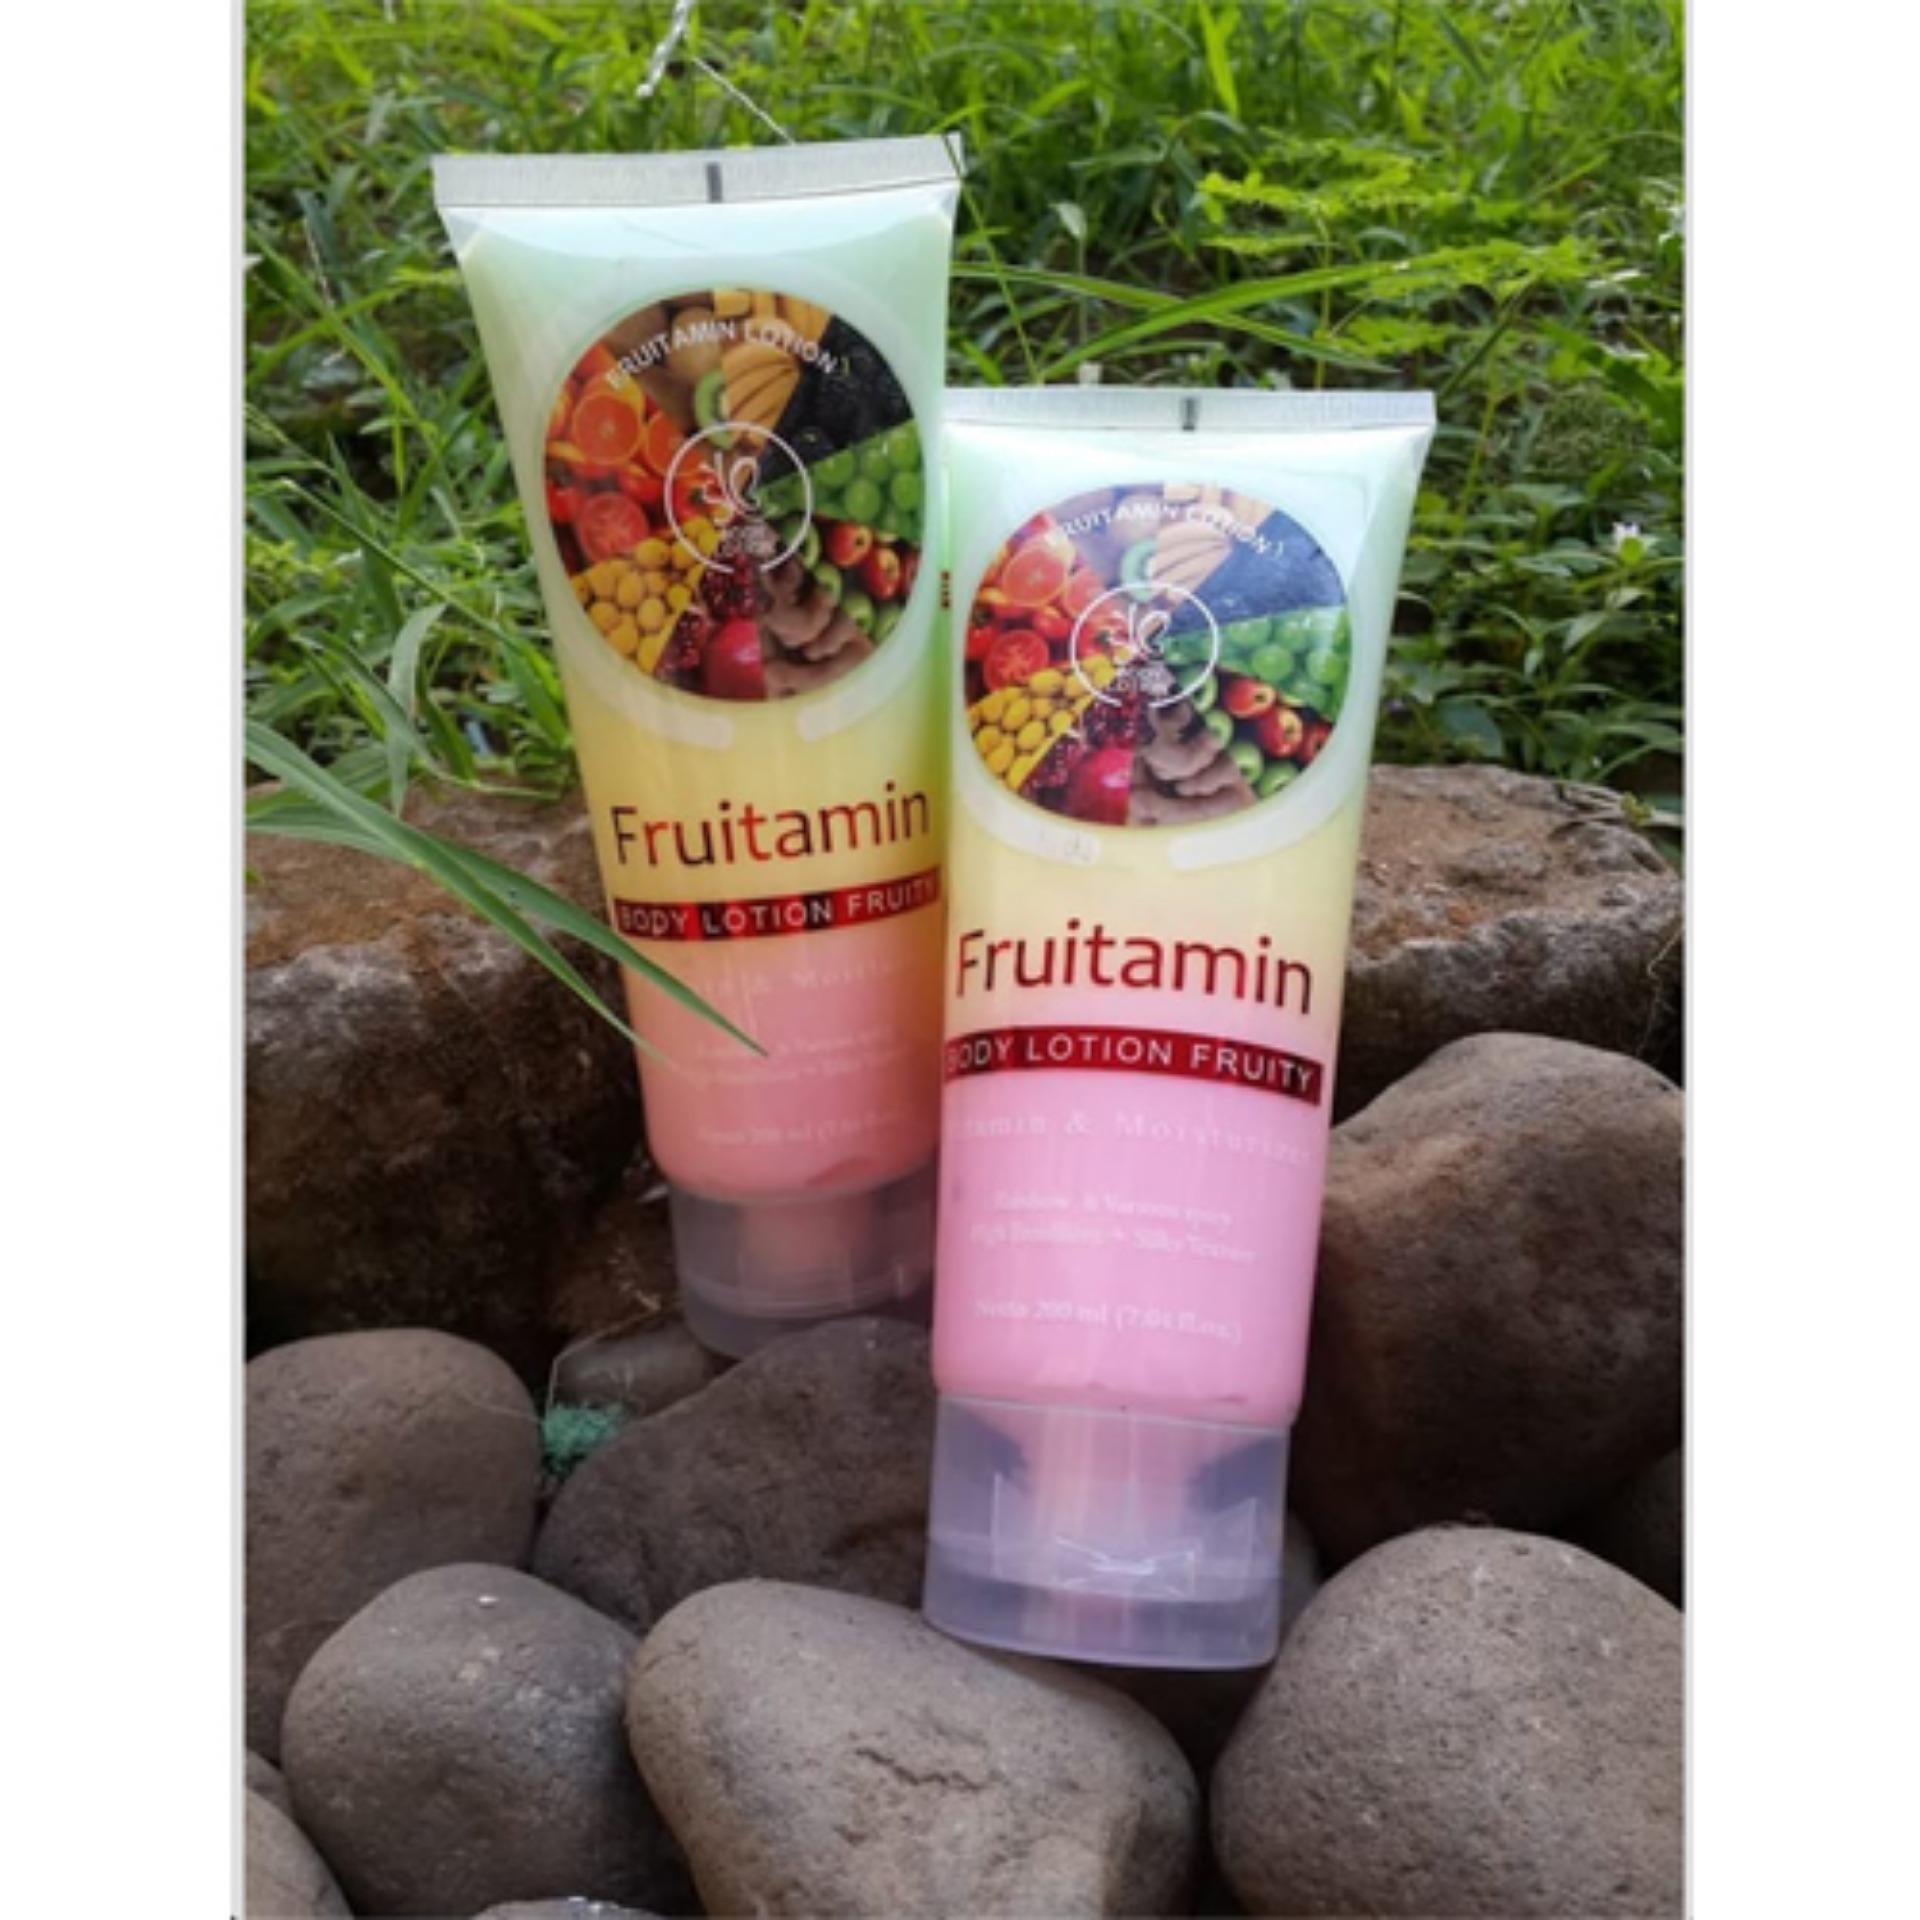 ... HOKI COD - SYB Body LOTION Spa FRUITAMIN Varian Fruit Extract Original Wangi Mencerahkan Kulit BPOM